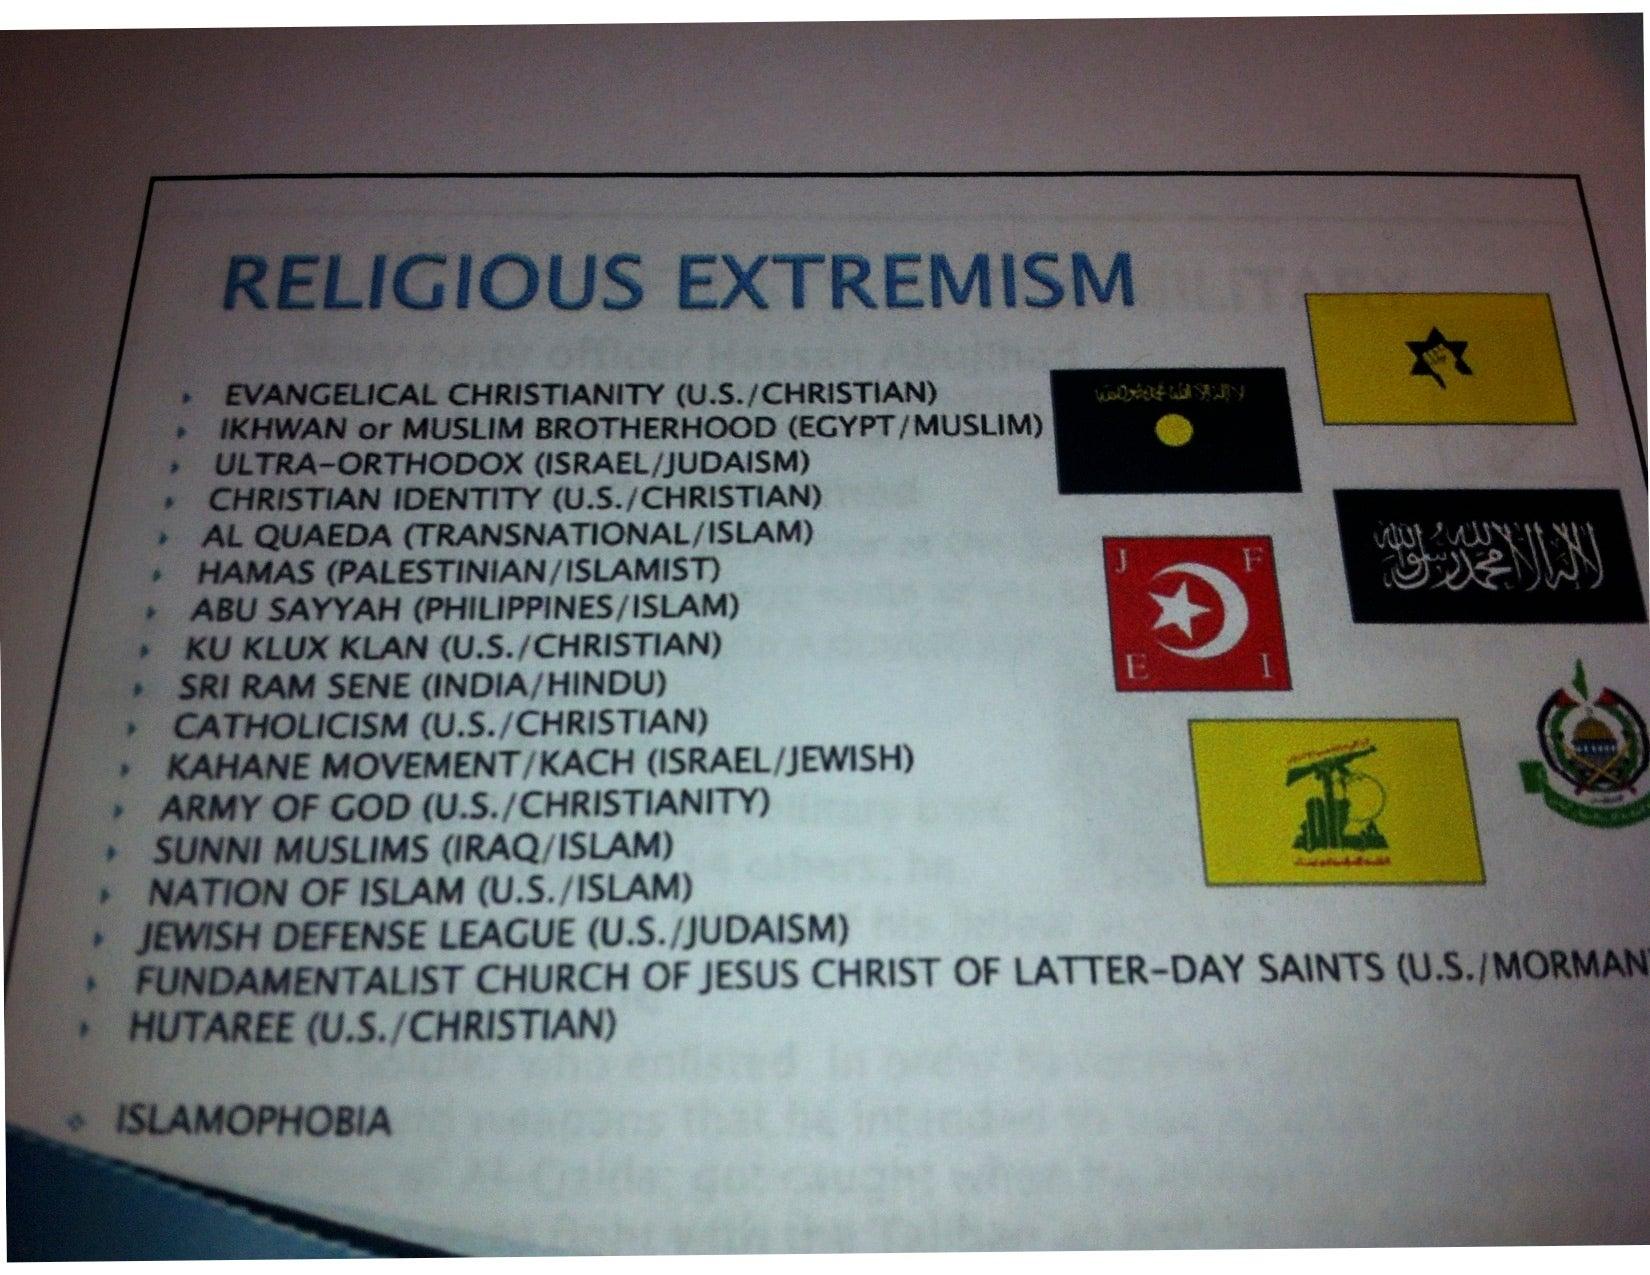 Religious Extremism Training Material Photo